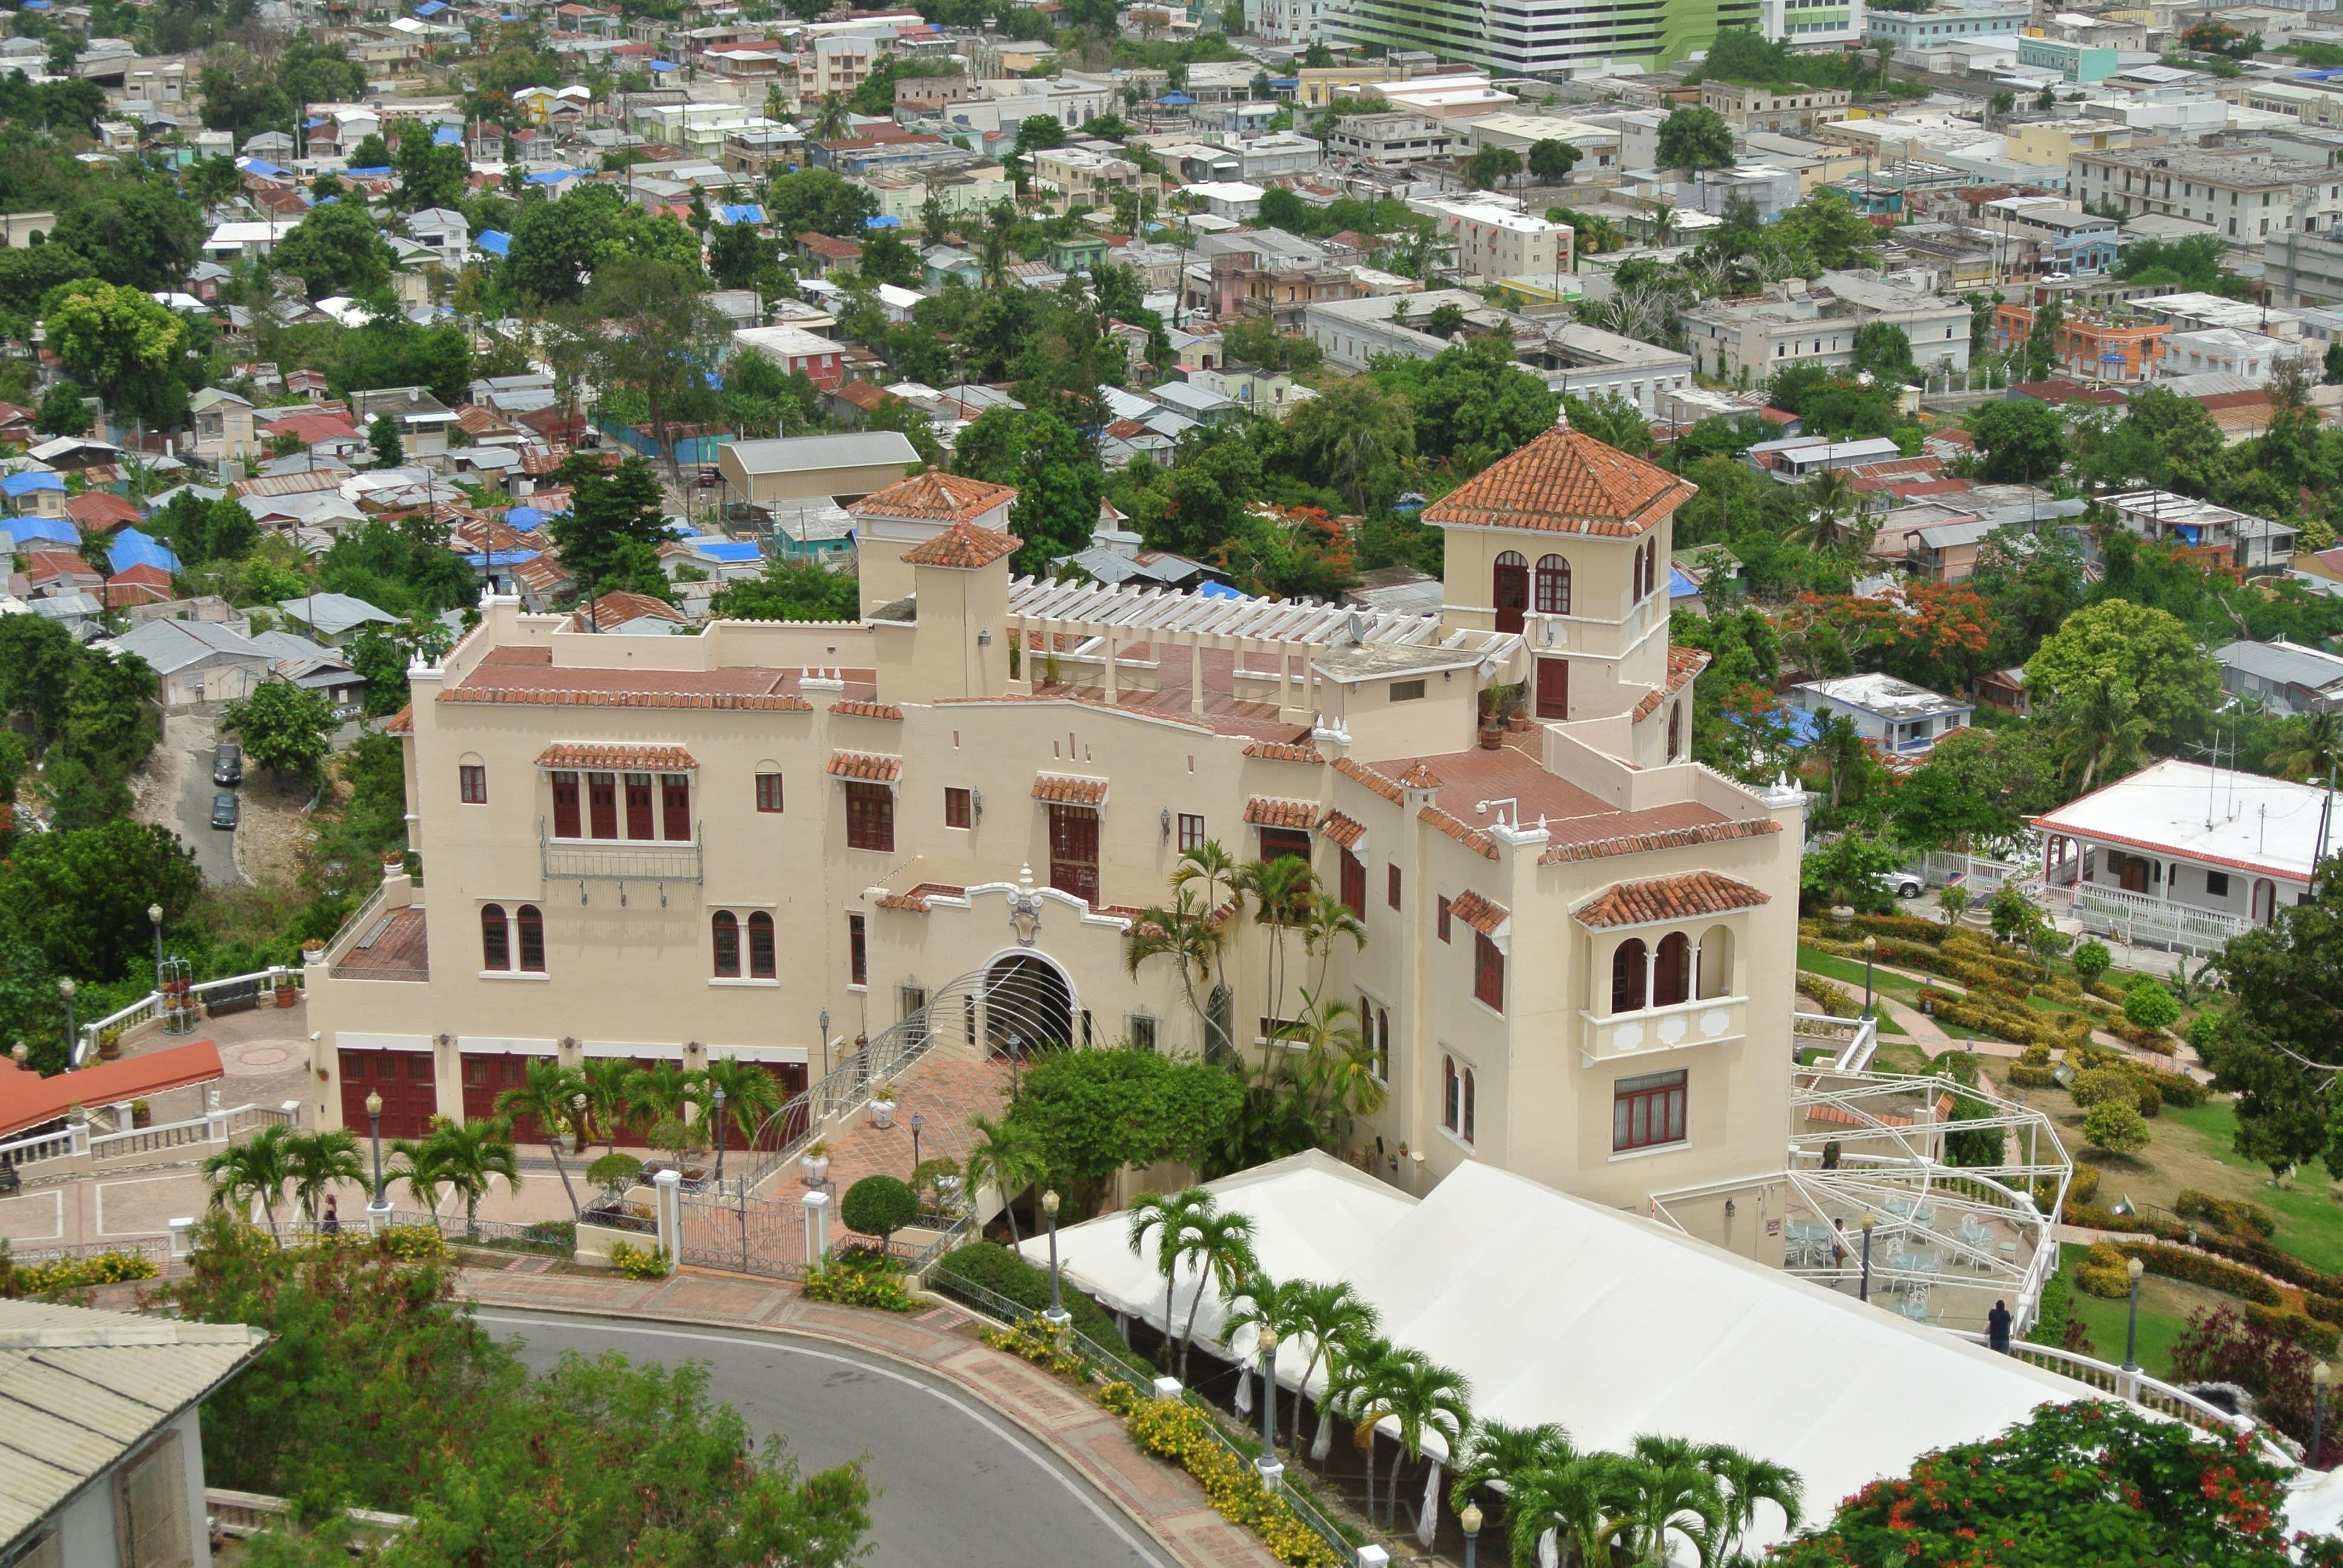 Serralles Castle is a top Puerto Rico landmark